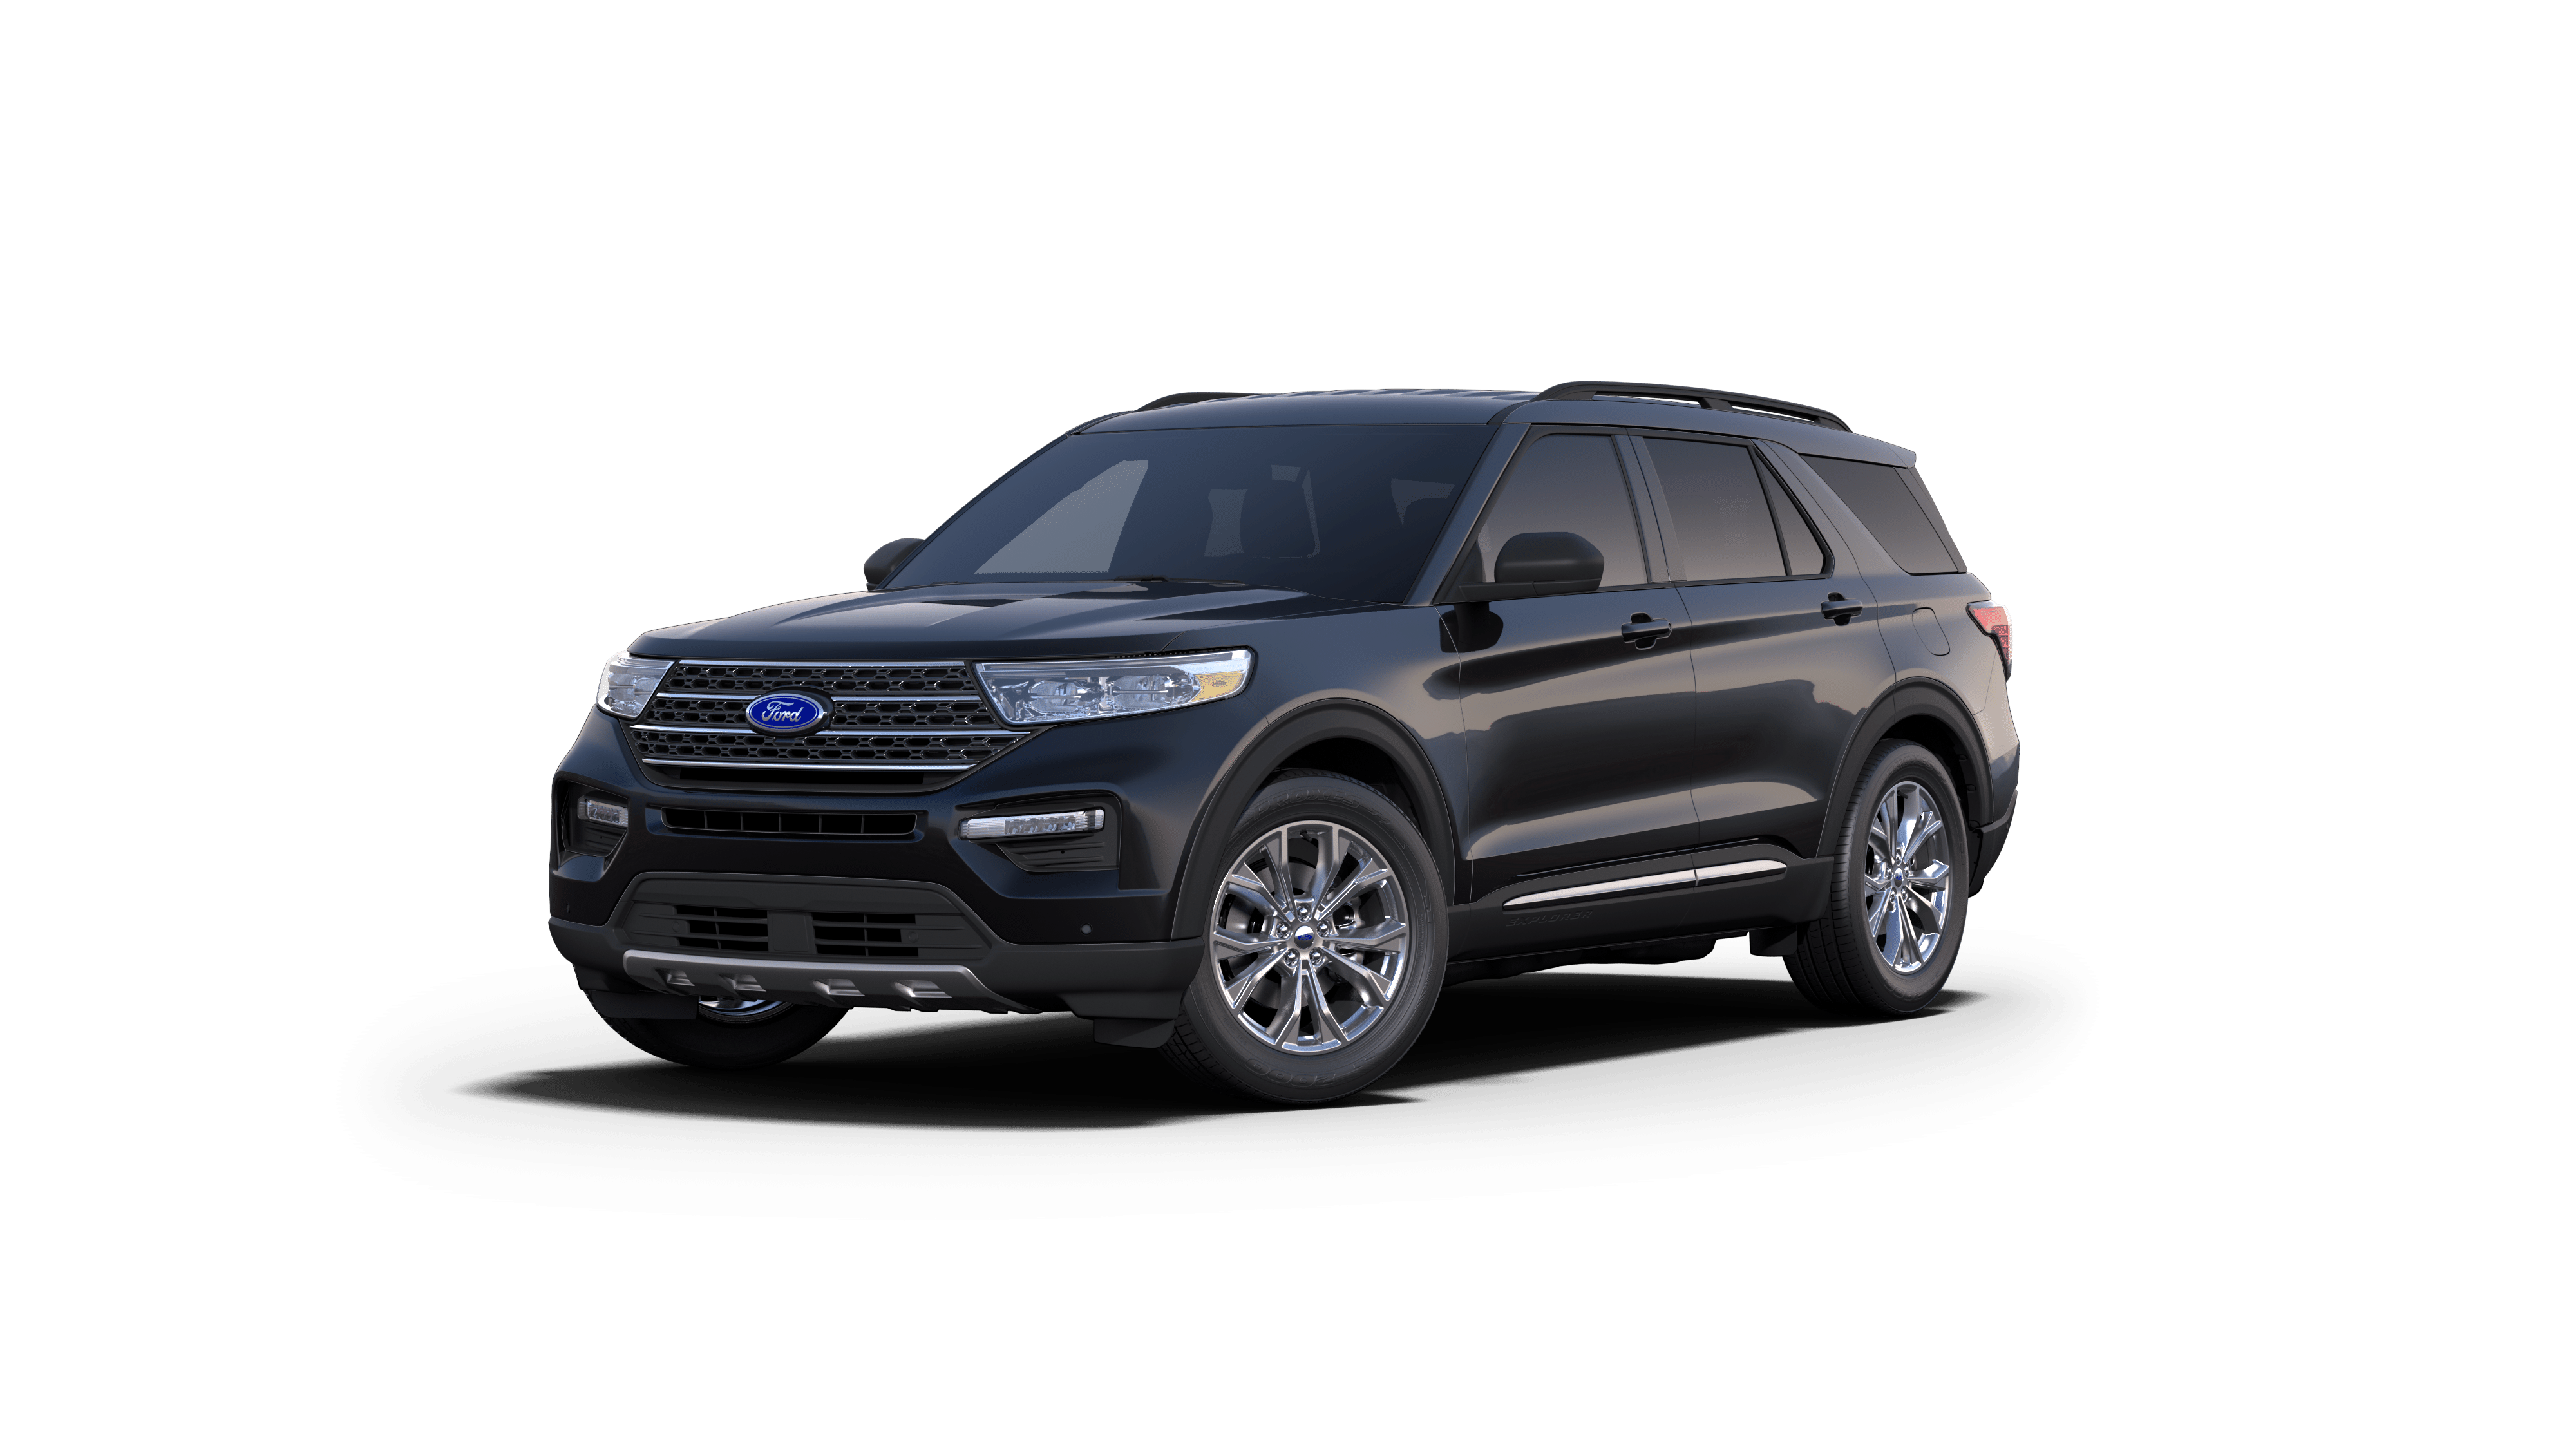 New Ford Explorer >> 2020 Ford Explorer For Sale In Marshall 1fmsk8dh9lgb40783